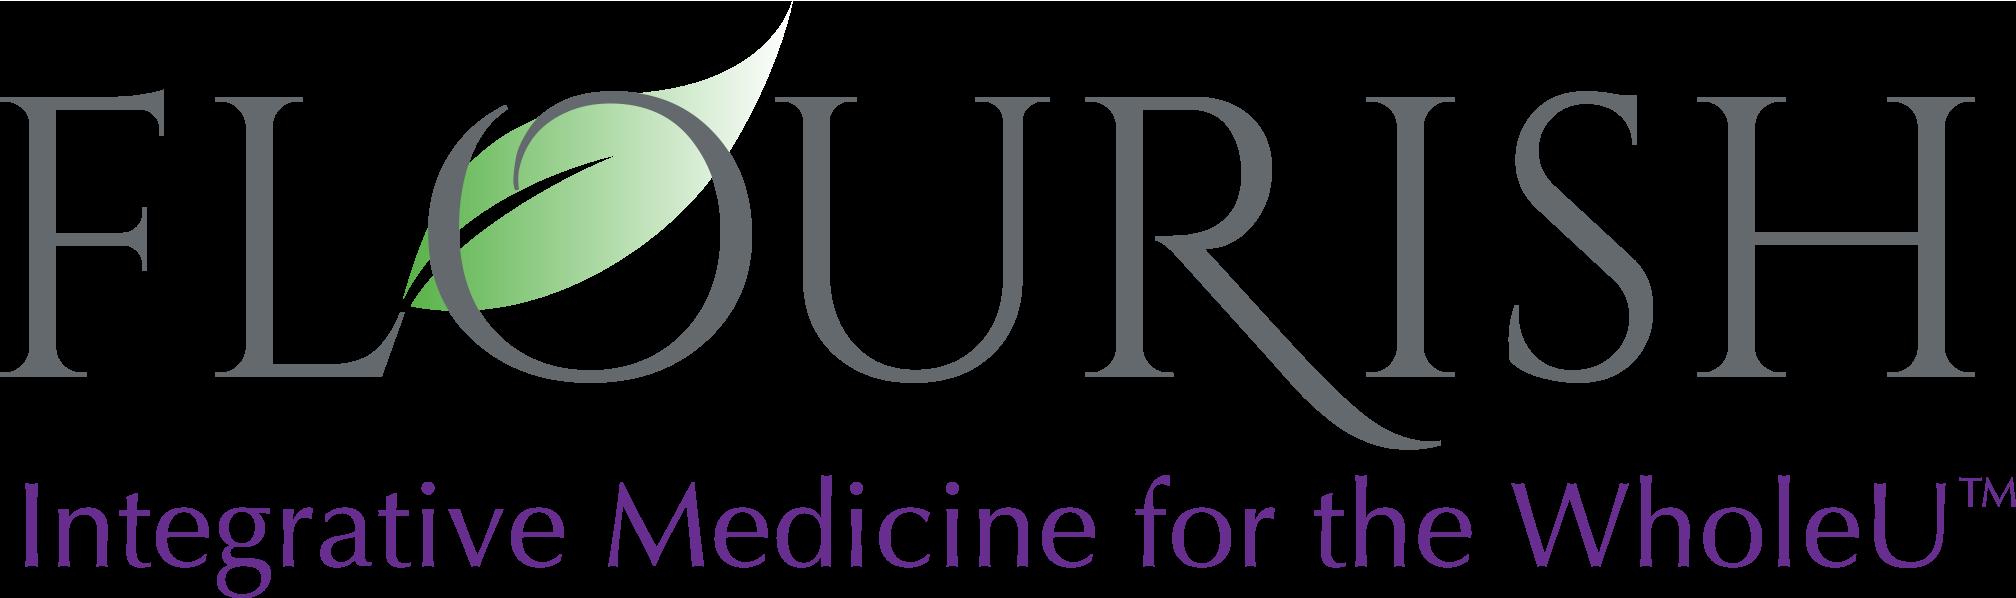 FLOURISH Integrative Medicine